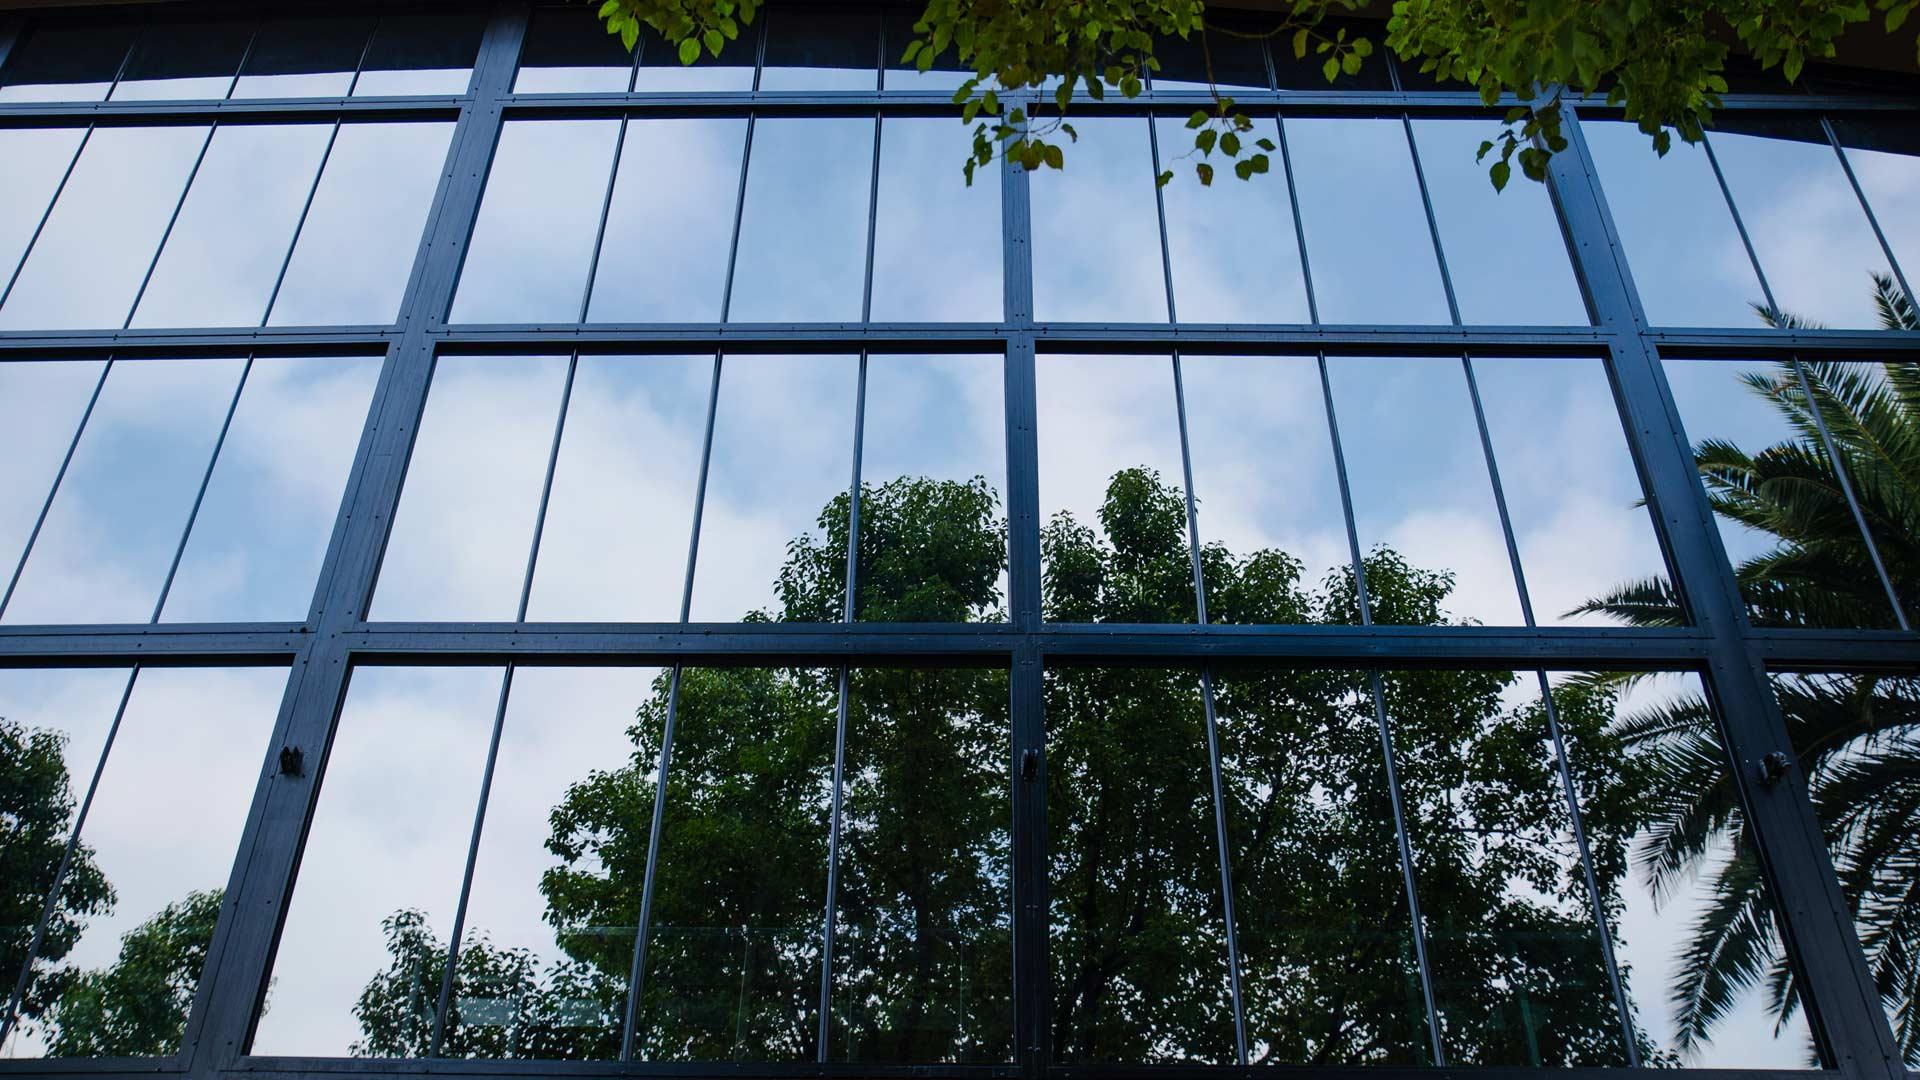 Commercial Solar Control Window Film - Exterior Neutral